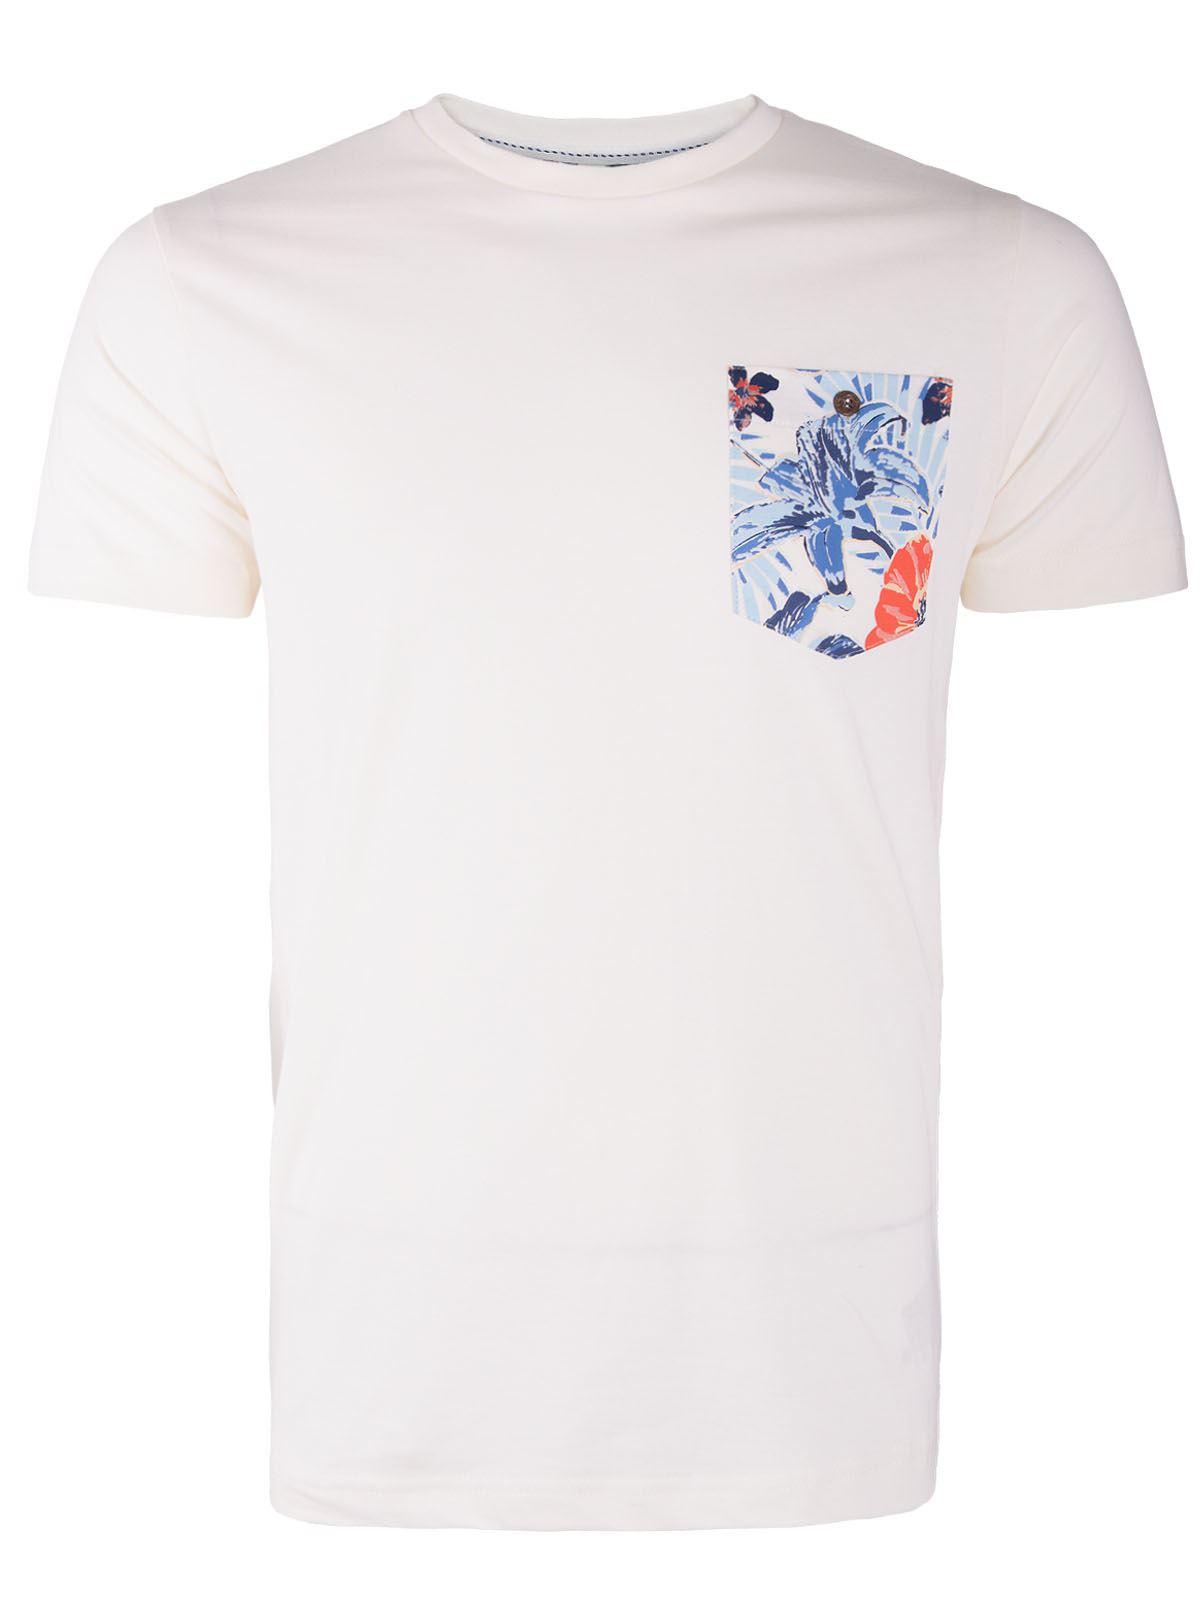 Mens Floral Print Top Cotton Crew Neck Casual Summer Short